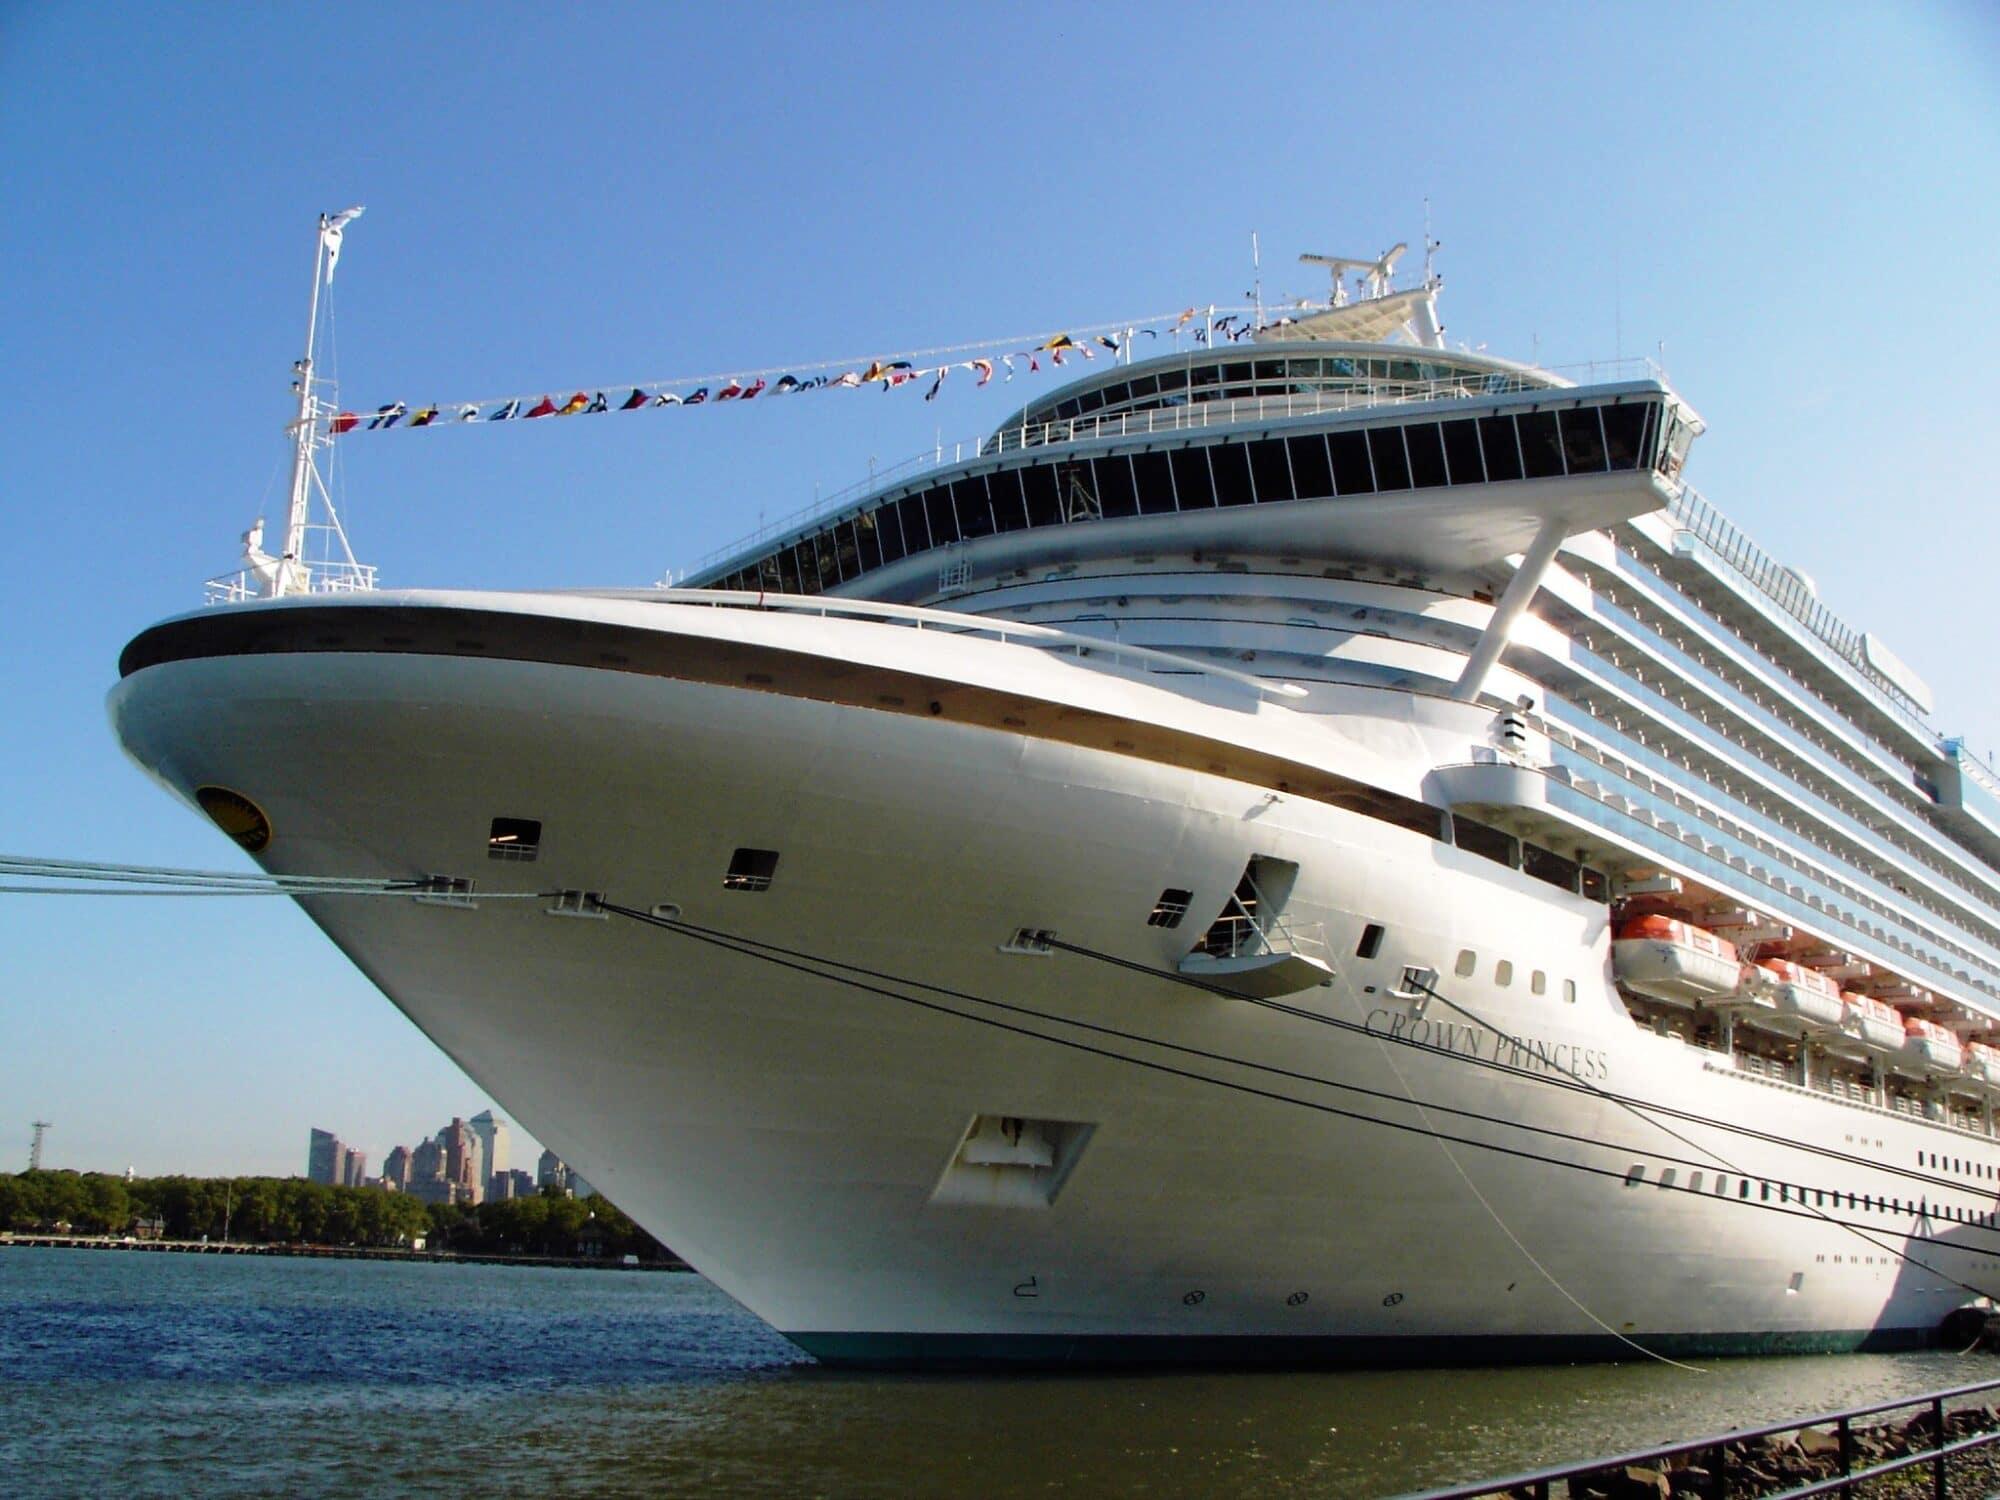 Princess to sail from LA to Mexico and Alaska